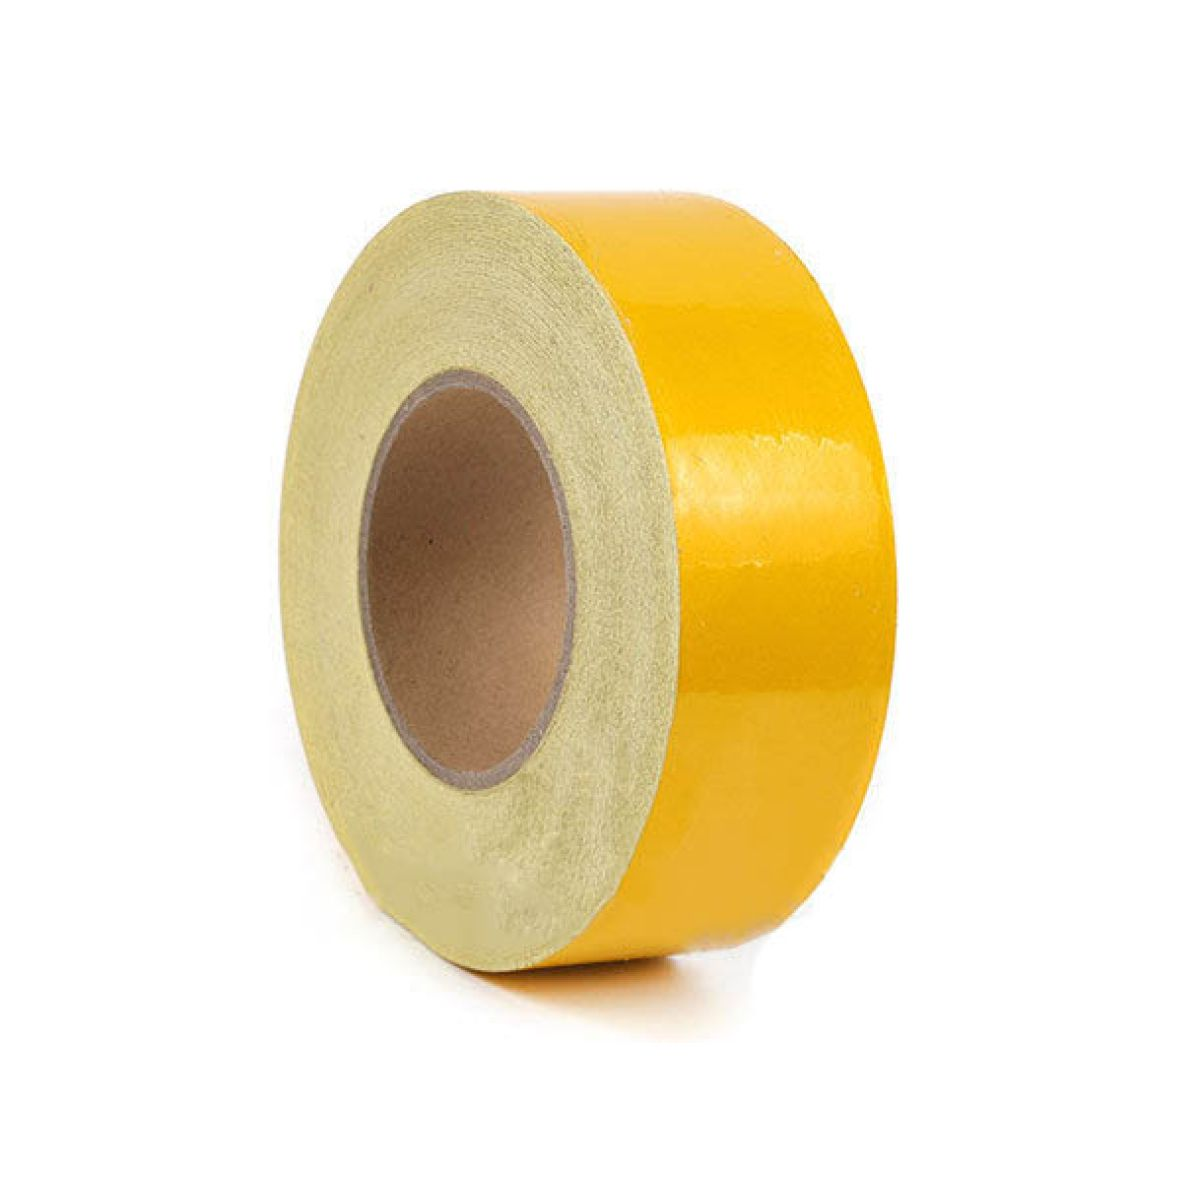 Лента светоотражающая желтая 5cm*45.7m